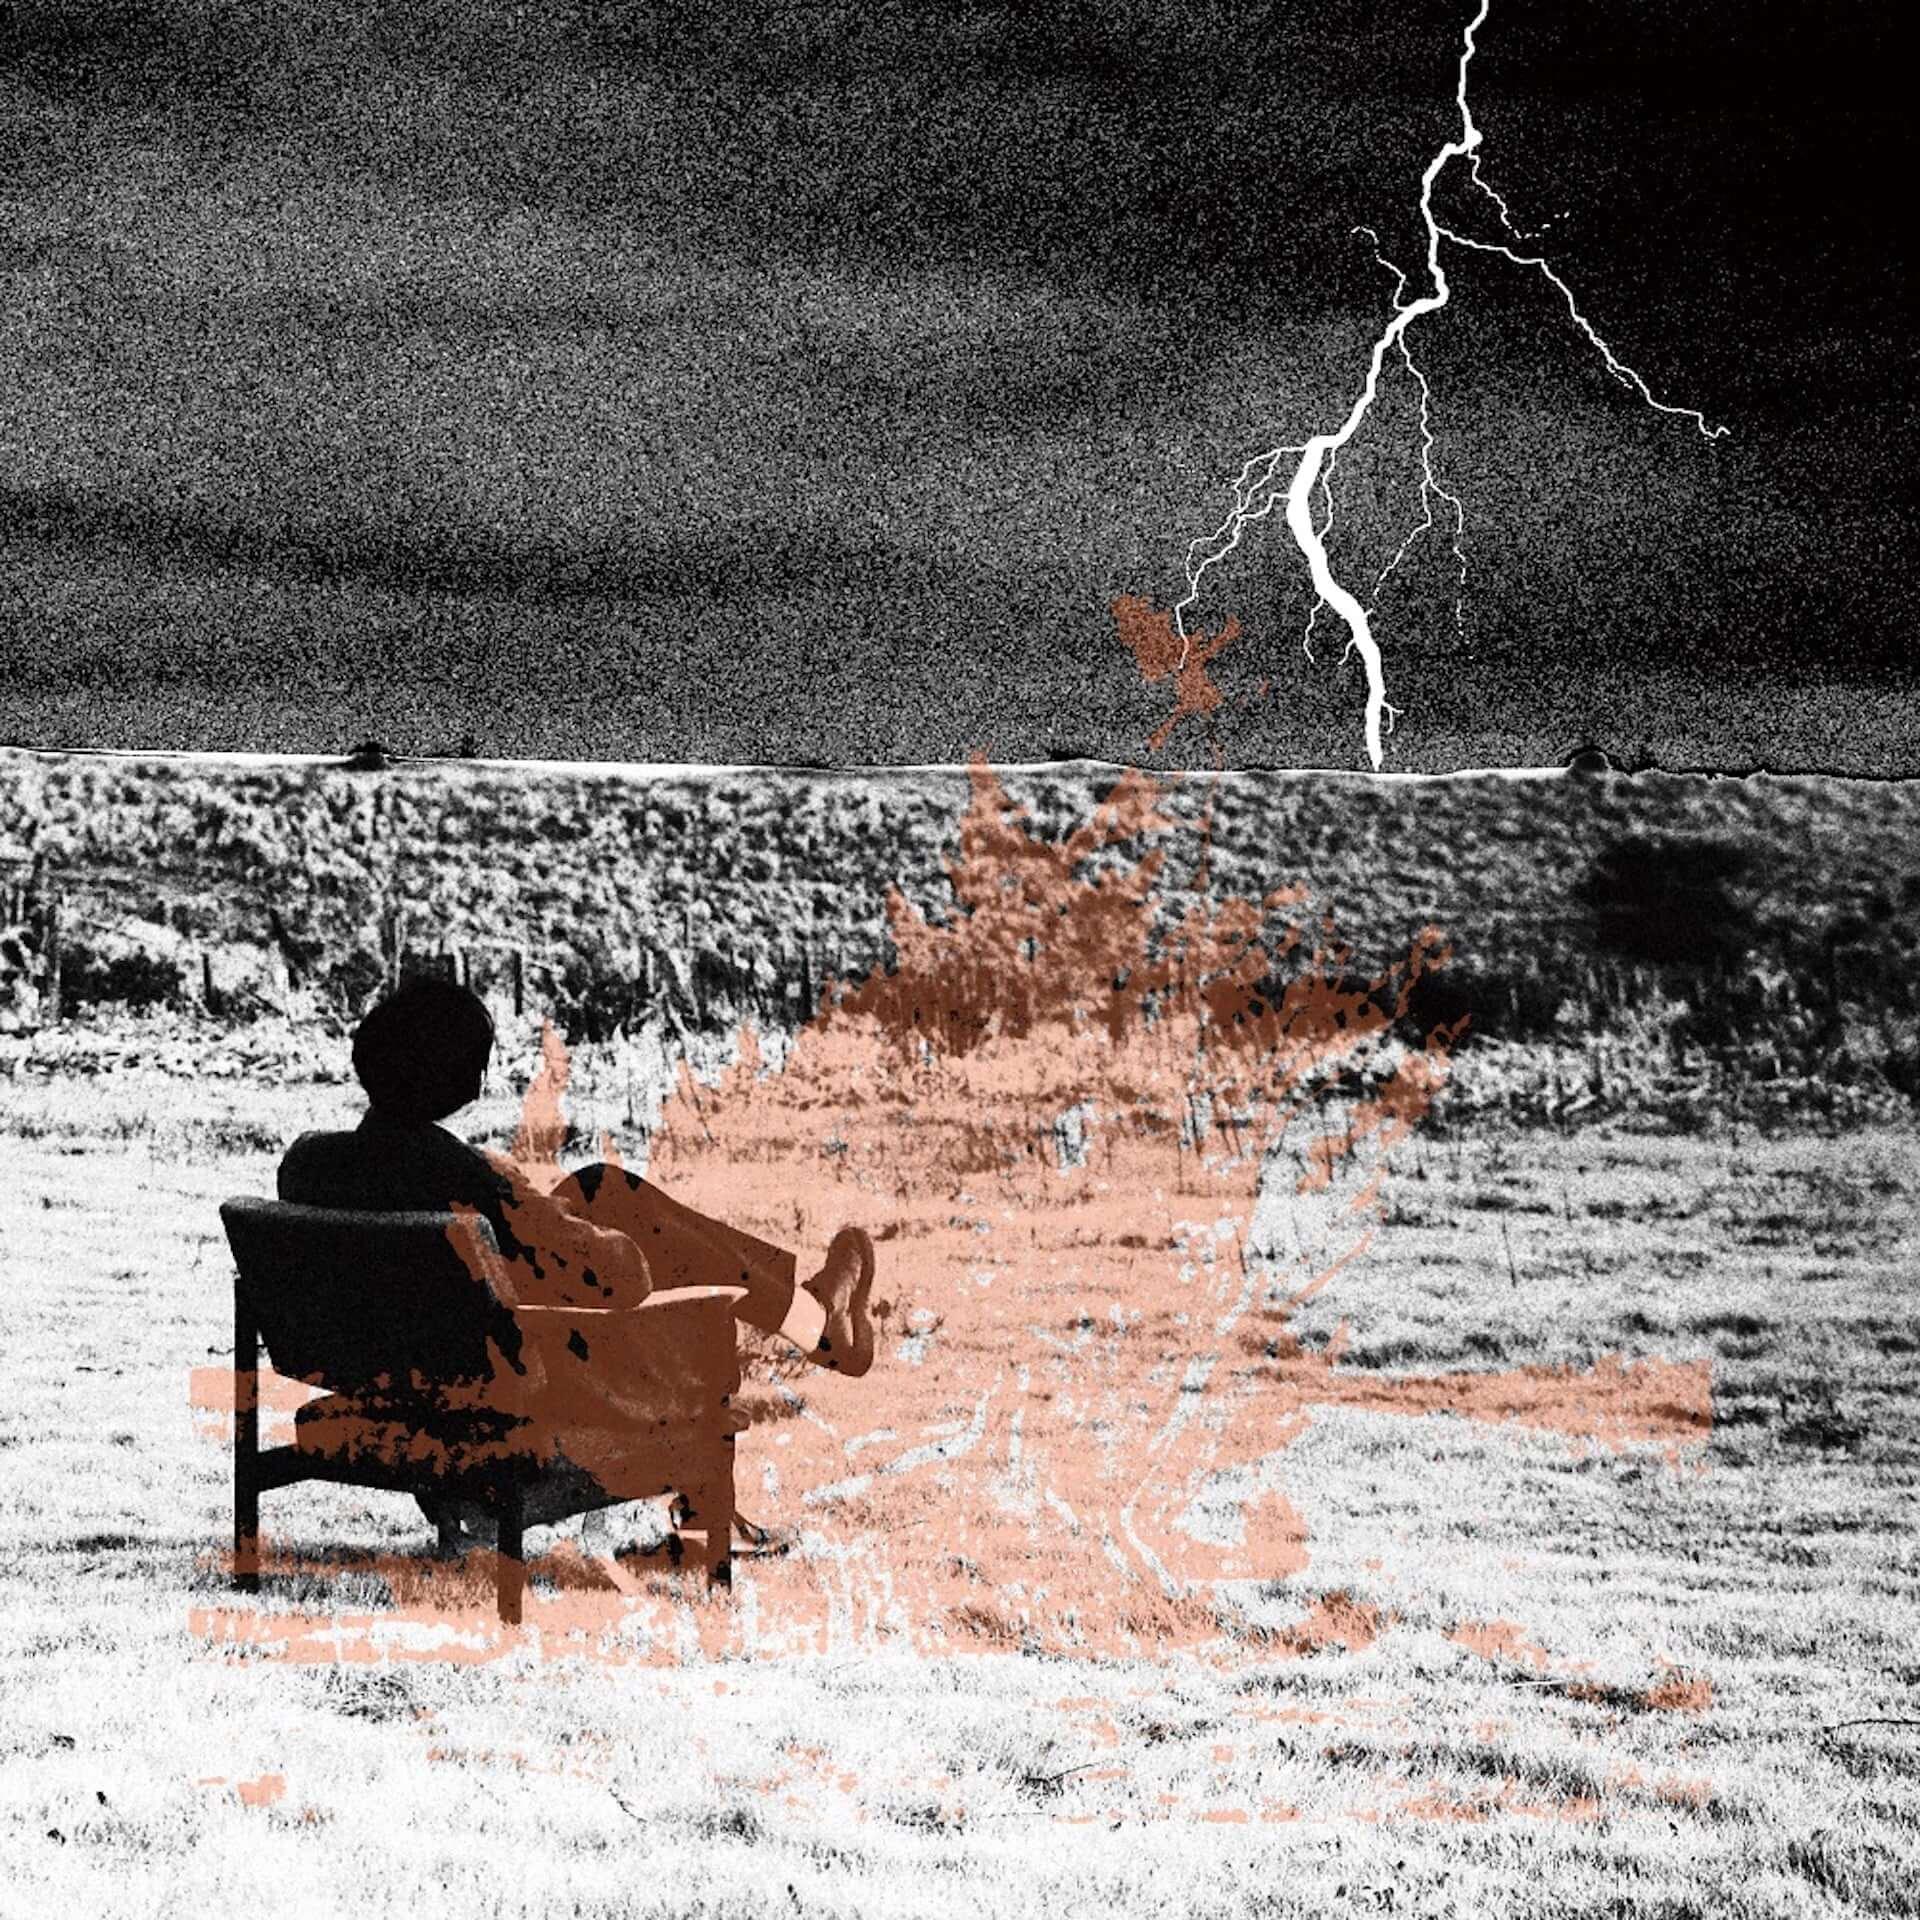 "cero髙城晶平ソロプロジェクトShohei Takagi Parallela Botanicaの1stアルバムから""ミッドナイト・ランデヴー""が配信開始!ティザー映像も公開 music200325_shohei_takagi_2-1920x1920"